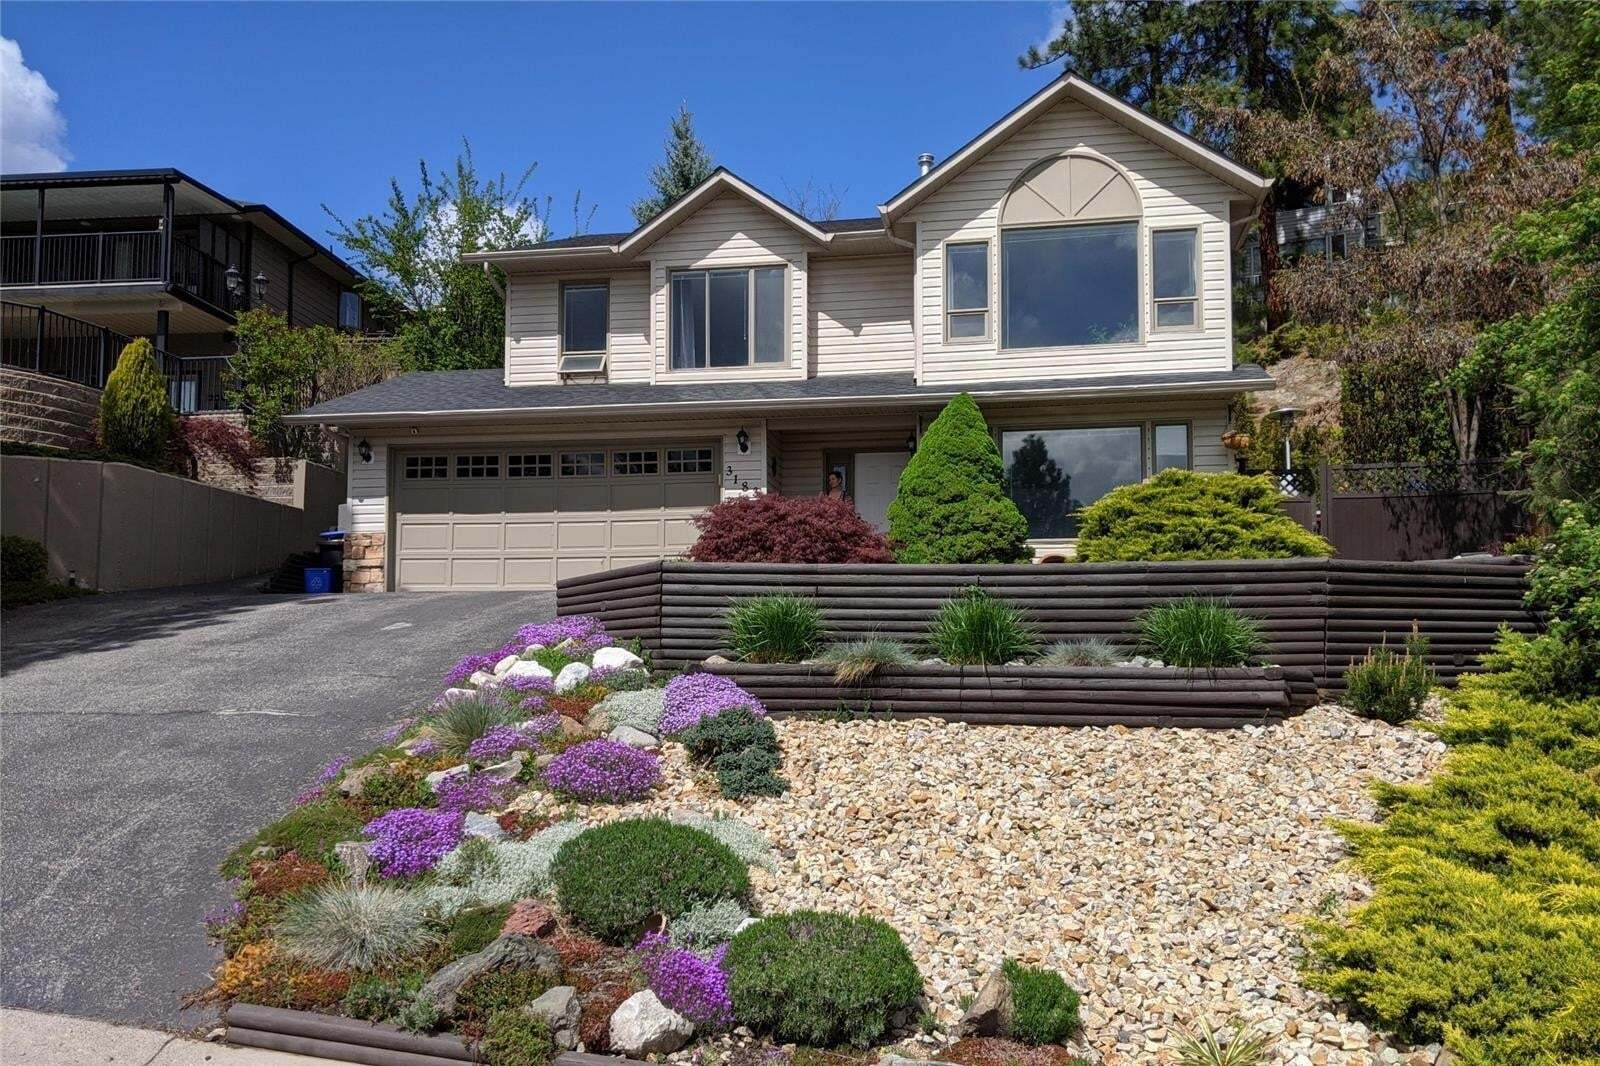 House for sale at 3183 Broadview Pl West Kelowna British Columbia - MLS: 10205707